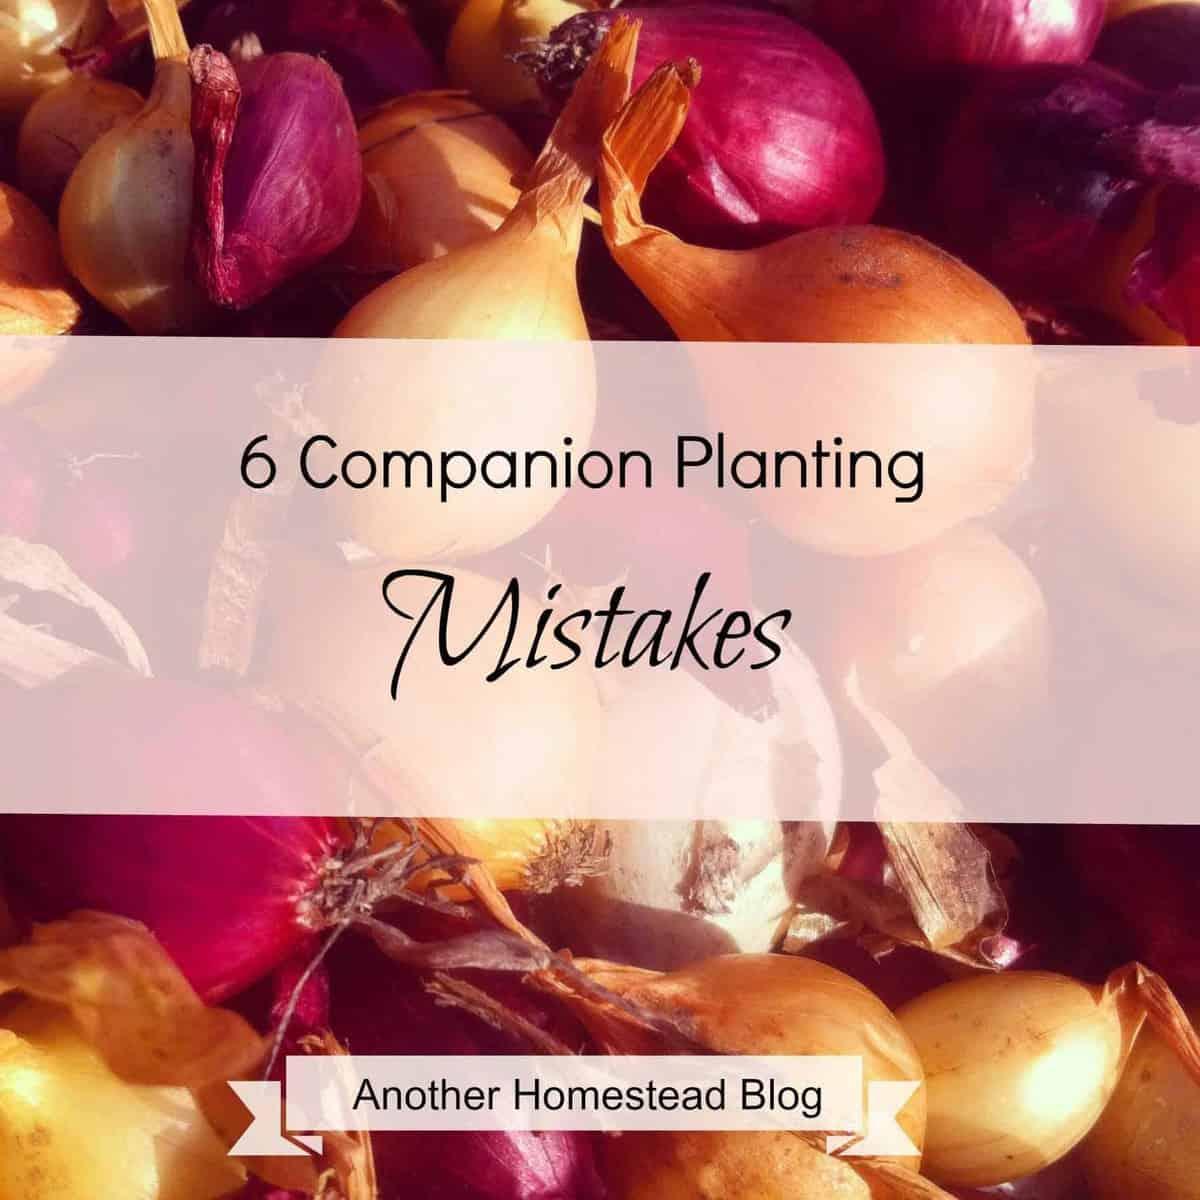 6 Companion Planting Mistakes to Avoid – FREE Printable!